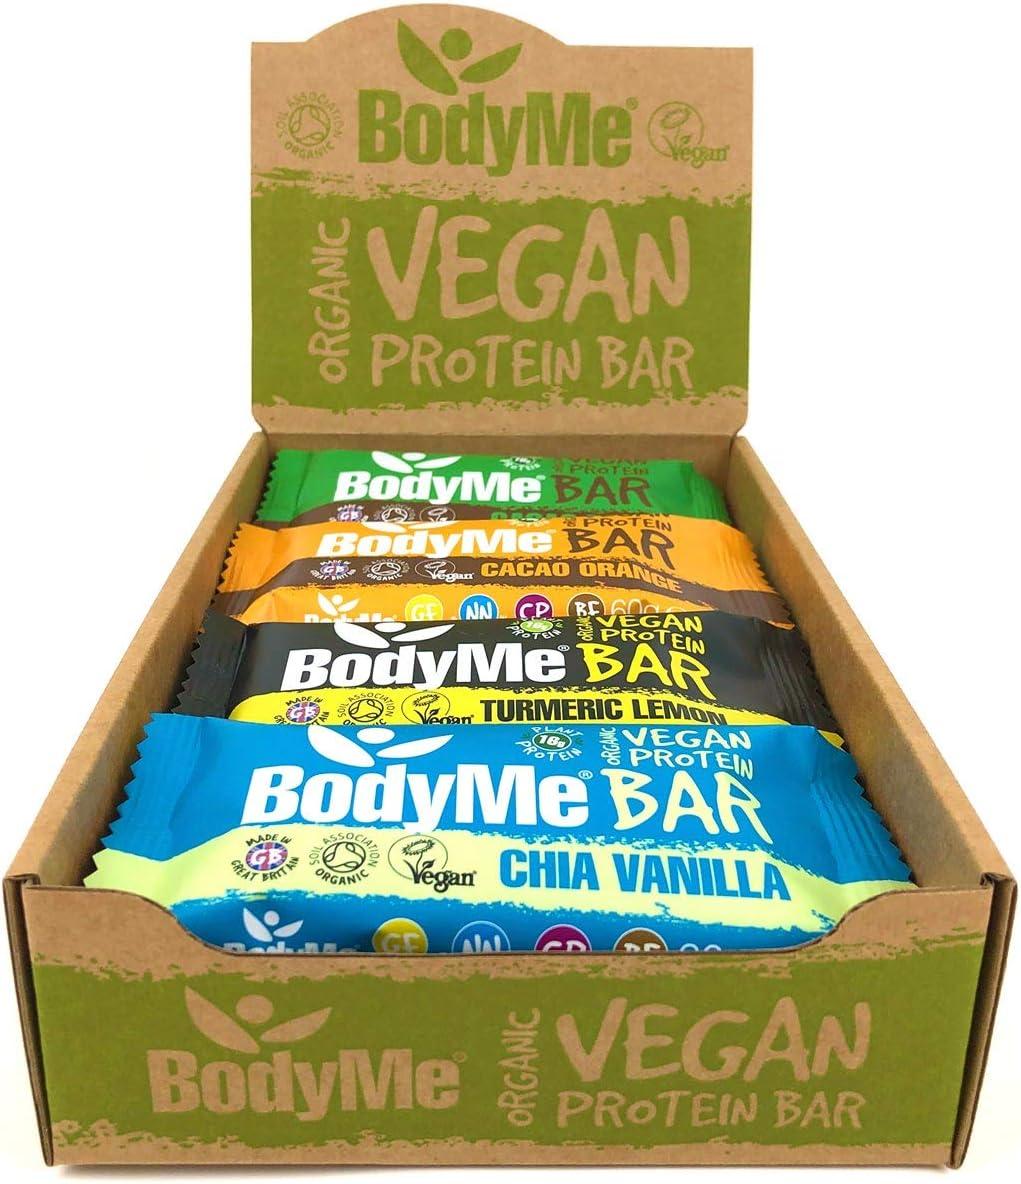 BodyMe Barritas Proteinas Veganas Organica | Caja Mixta | 12 x 60g Barra Proteina Vegana | Sin Gluten | 16g Proteína Completa | 3 Proteina Vegetal | ...